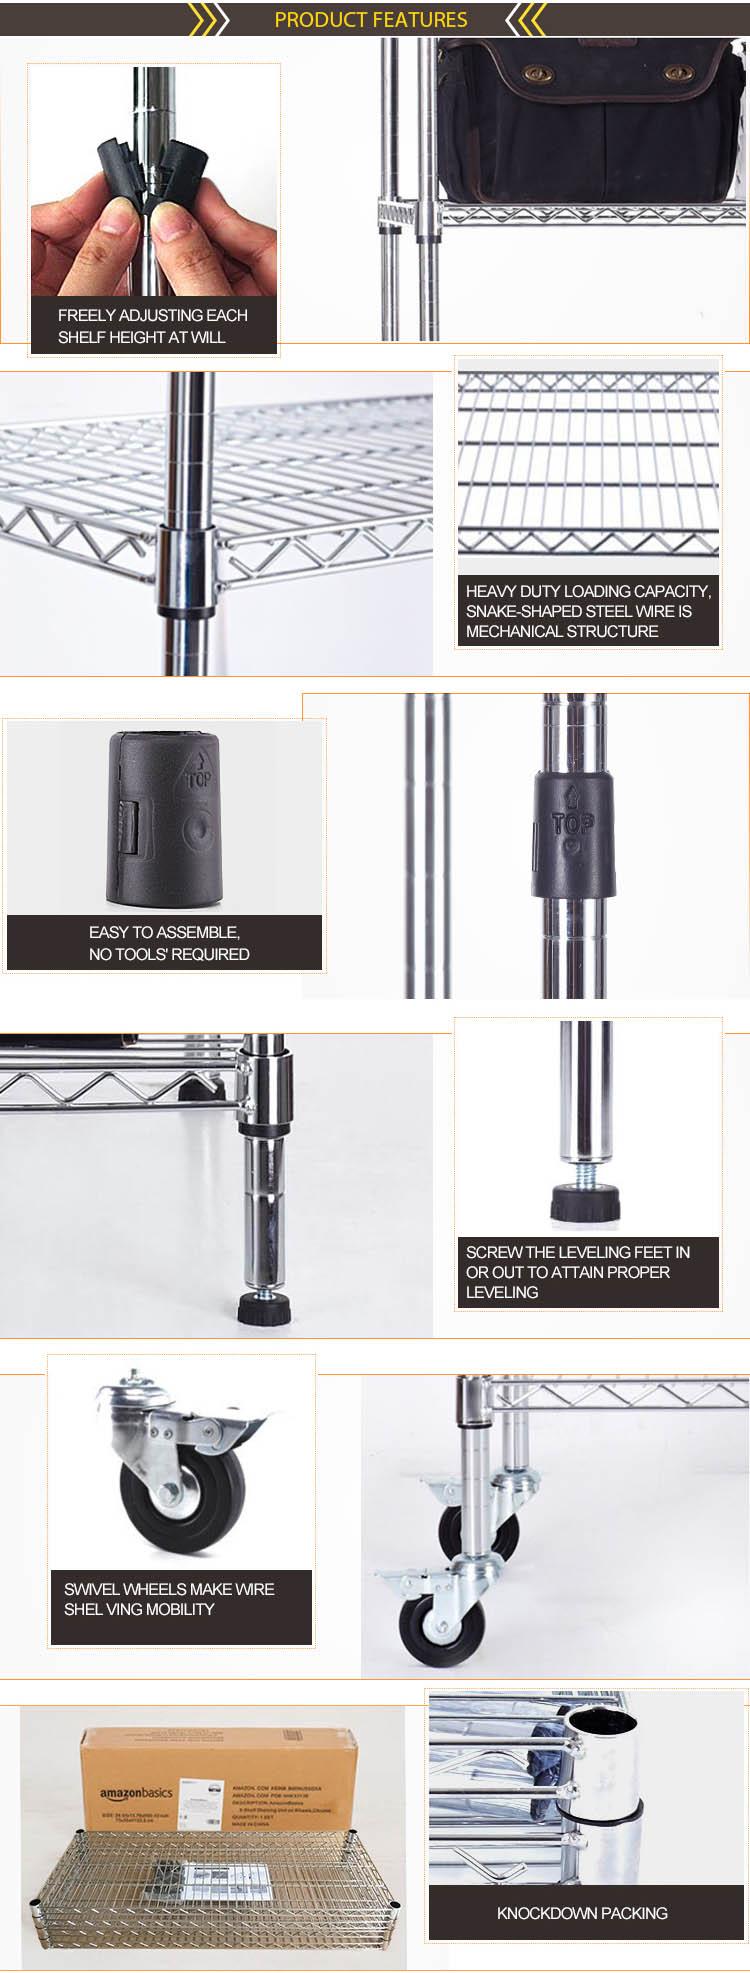 NSF Adjustable Metal Drugstore Pharmacy Wire Shelf Rack with Wheels